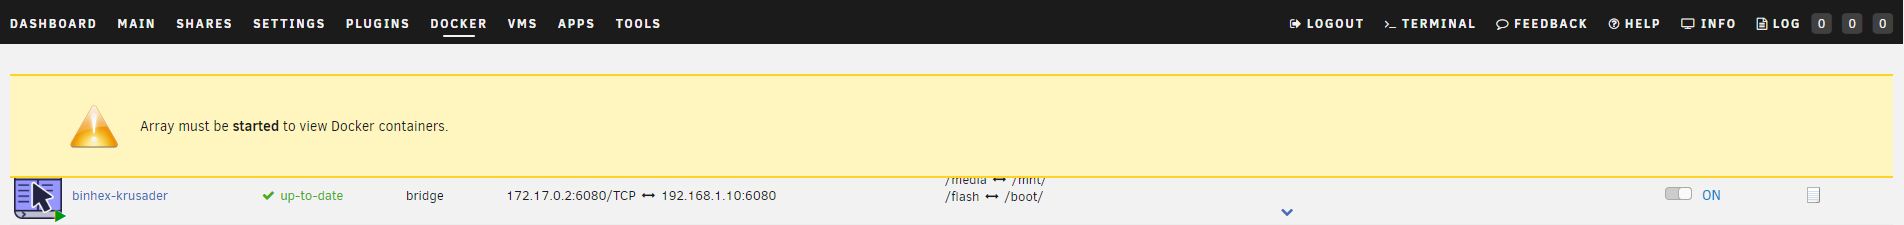 Docker page alert UI - 6 6 3 - Stable Releases - Unraid